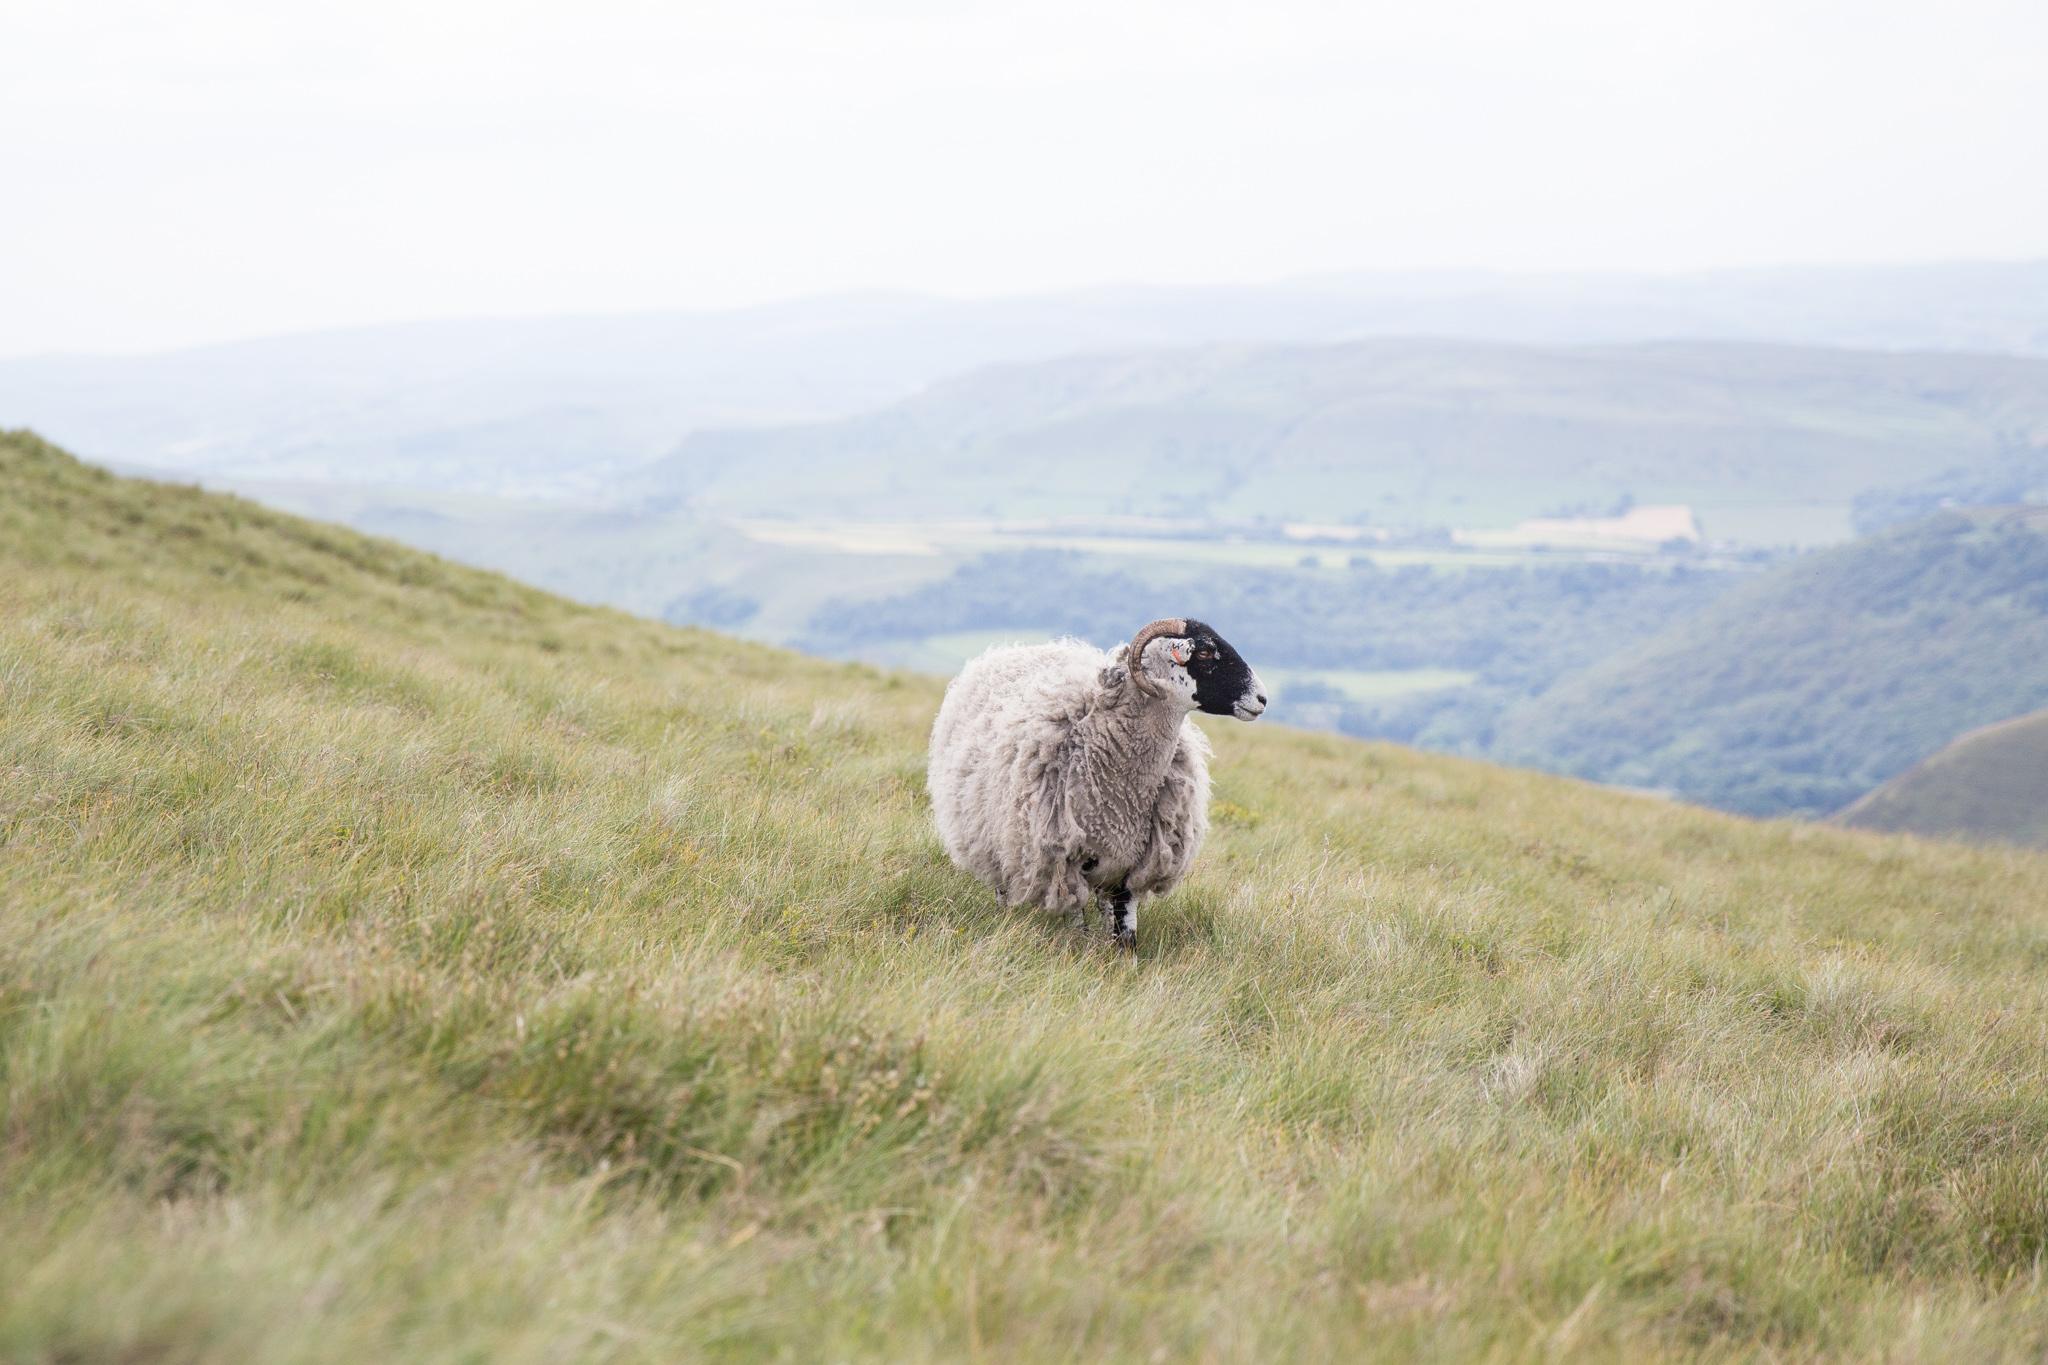 7845-uk-best-wildlife.jpg